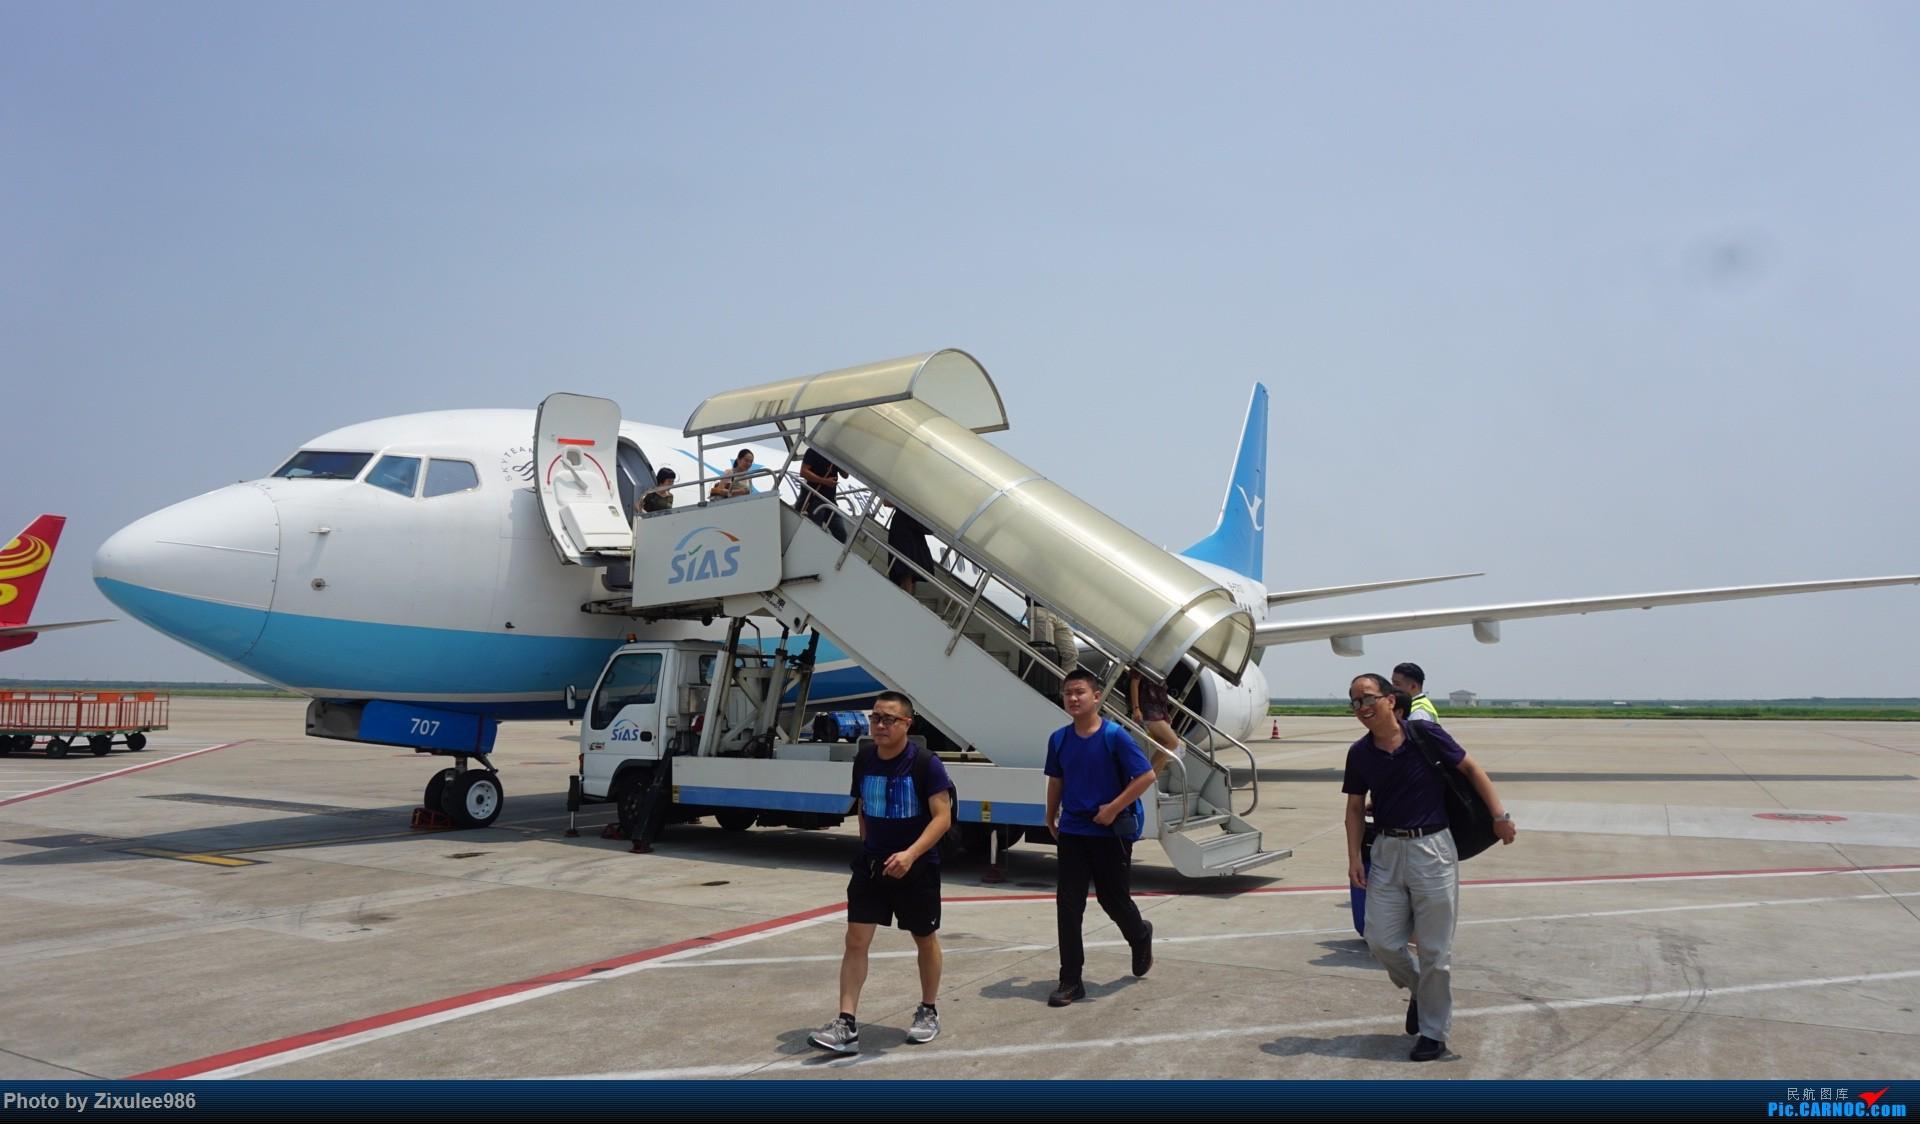 Re:[原创]加拿大21日游学之旅(一)~JJN-PVG-YYZ..(内含flightlog)~第一次发游记~多图缓更请谅解 BOEING 737-85C(WL) B-5707 中国上海浦东国际机场